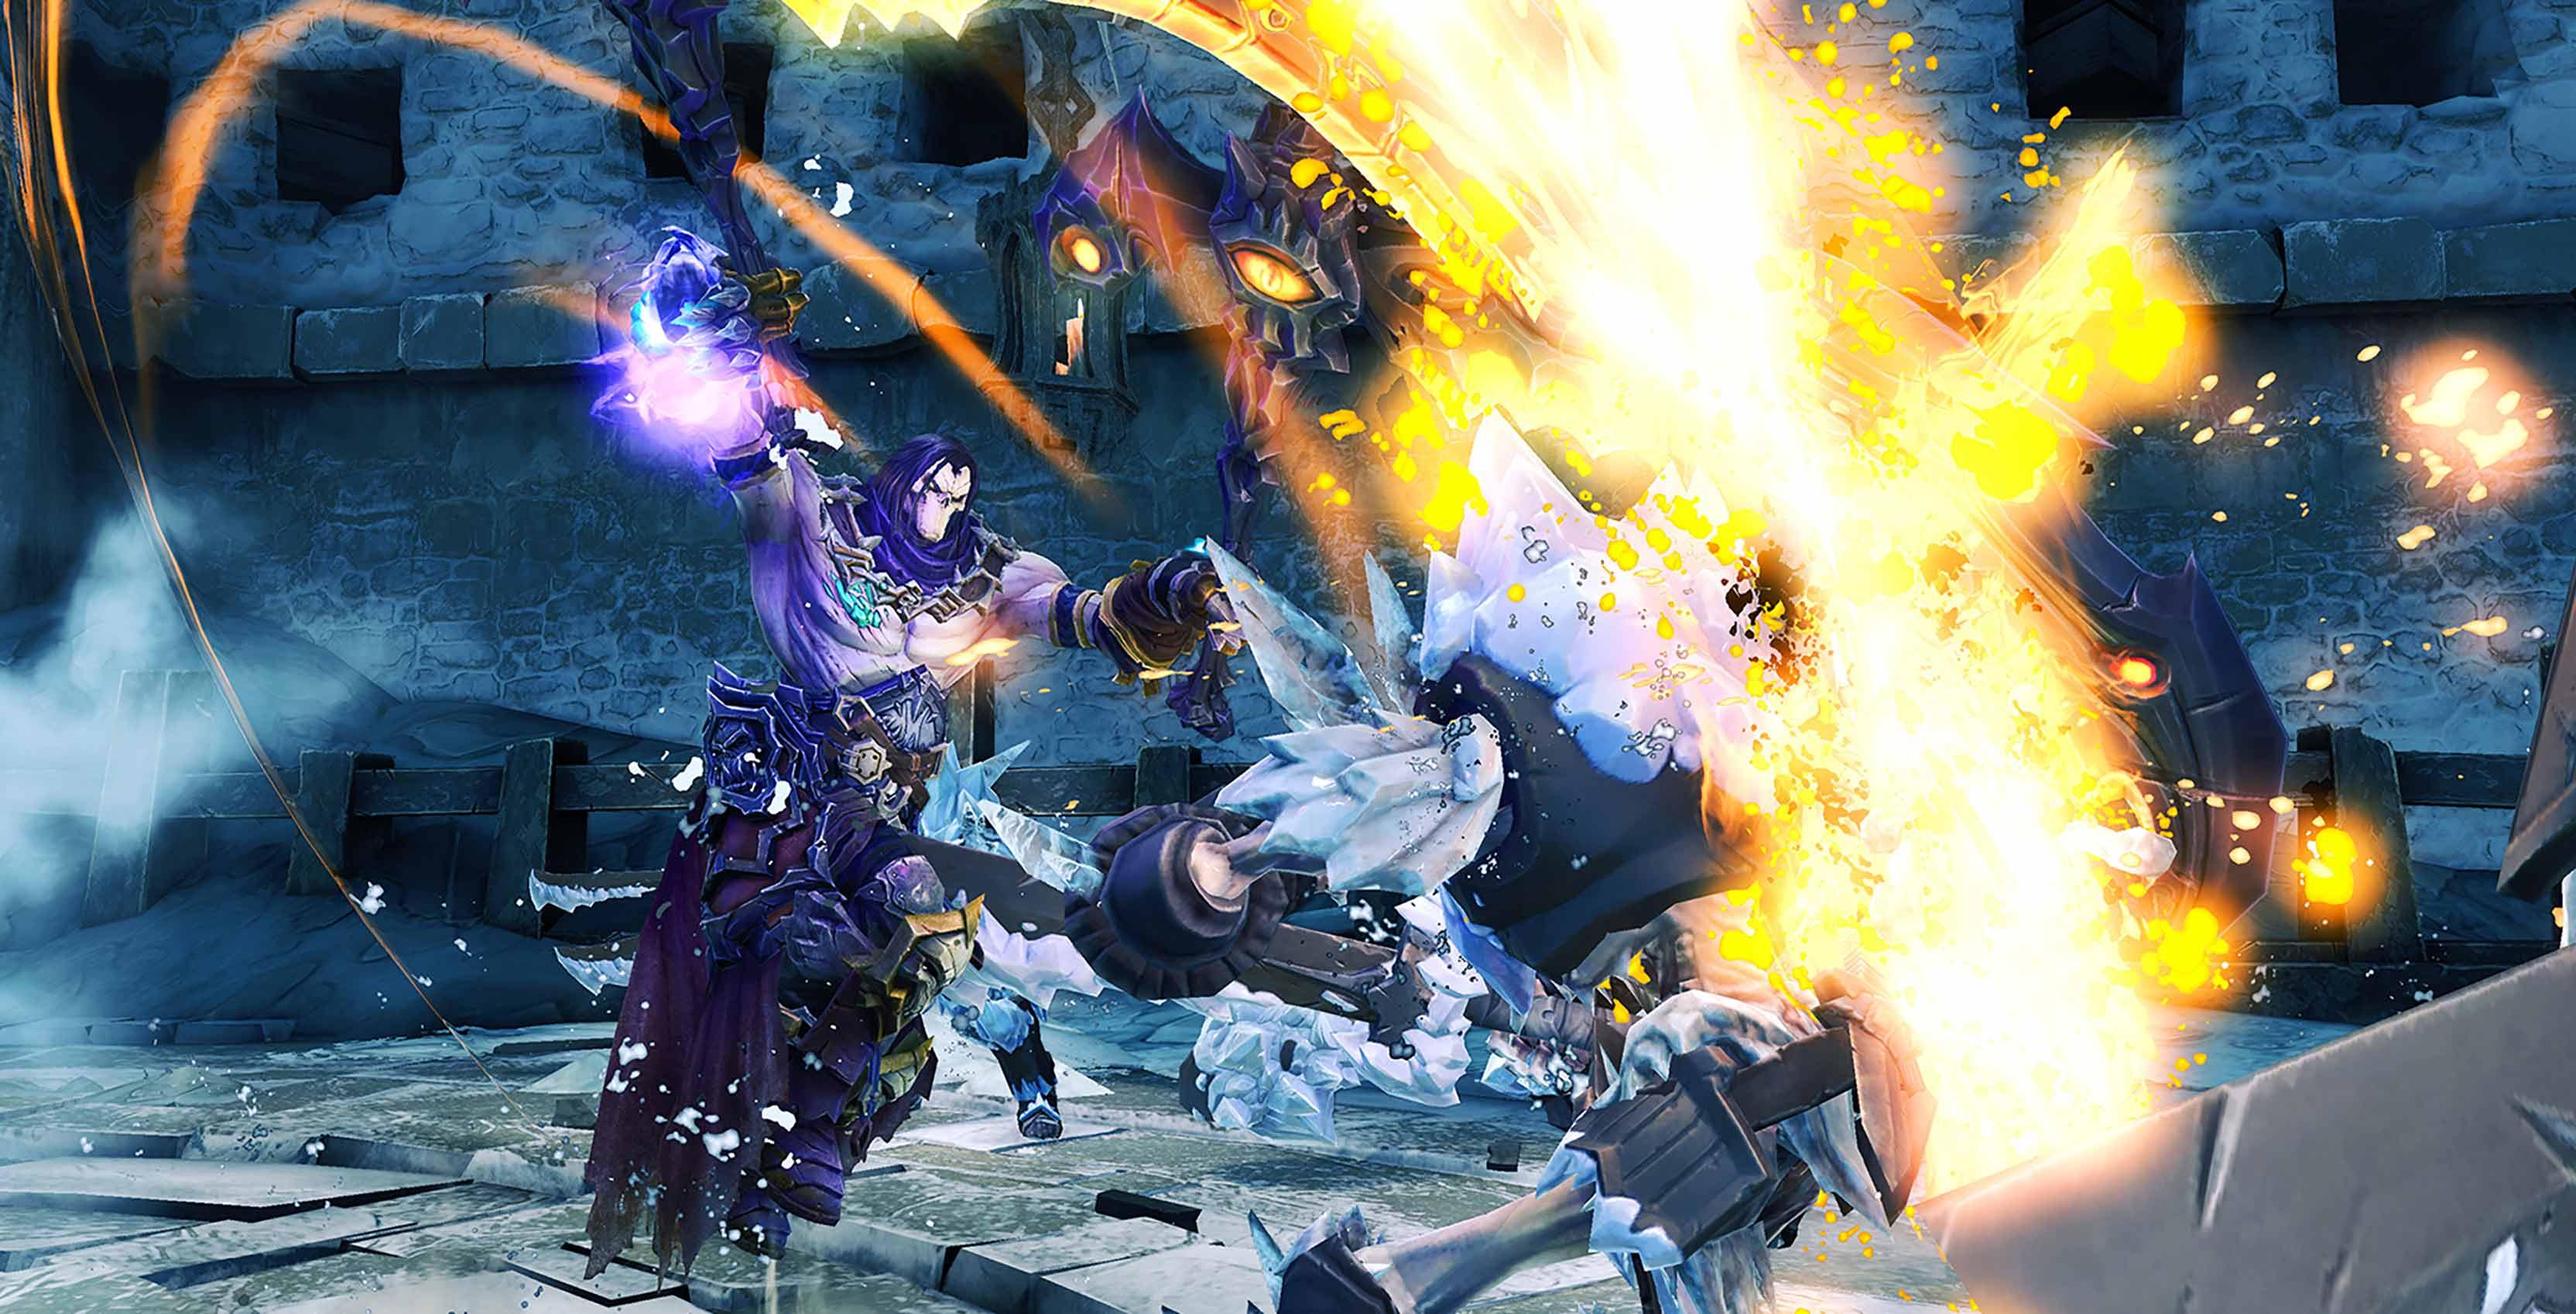 Darksiders II Deathinitive Edition combat